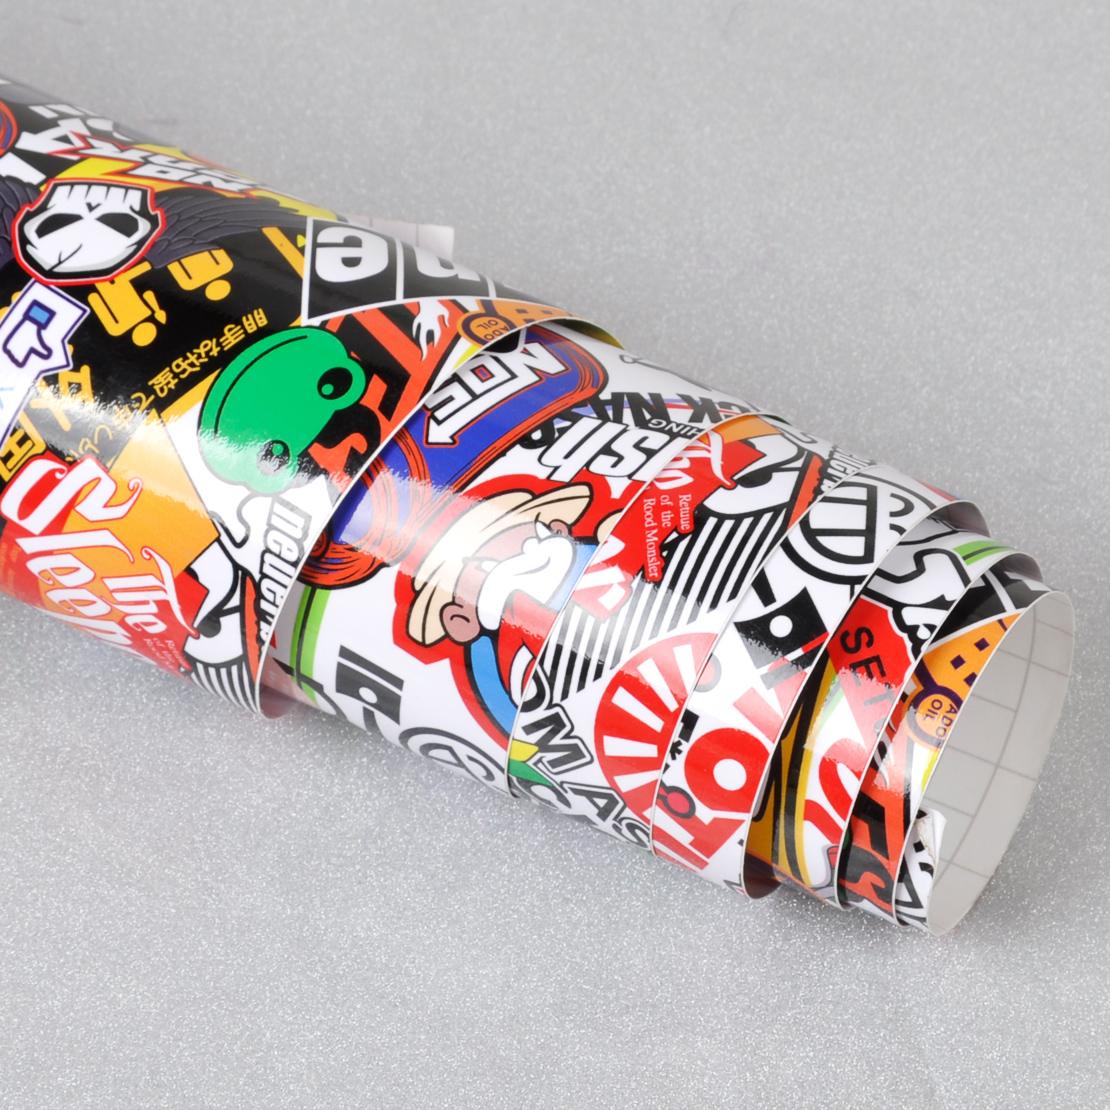 60 x 20 jdm animal cartoon graffiti car sticker bomb wrap sheet decal sticker ebay. Black Bedroom Furniture Sets. Home Design Ideas